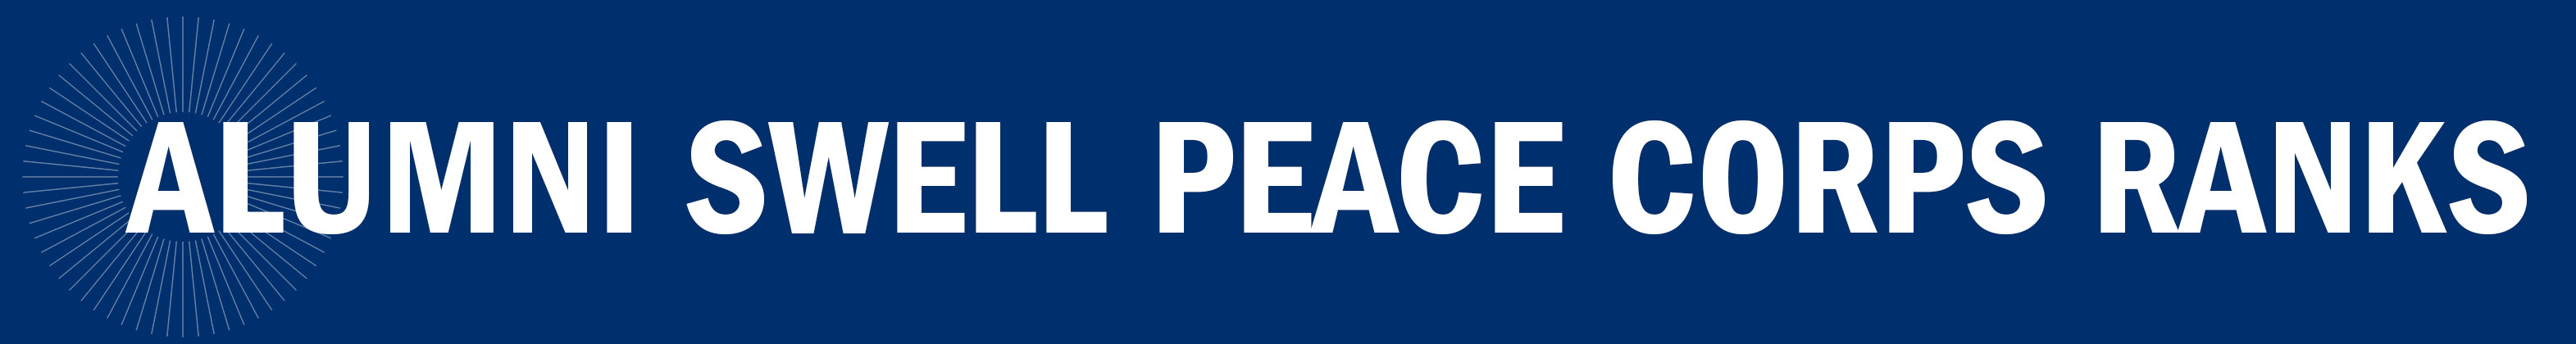 Alumni Swell Peace Corps Ranks